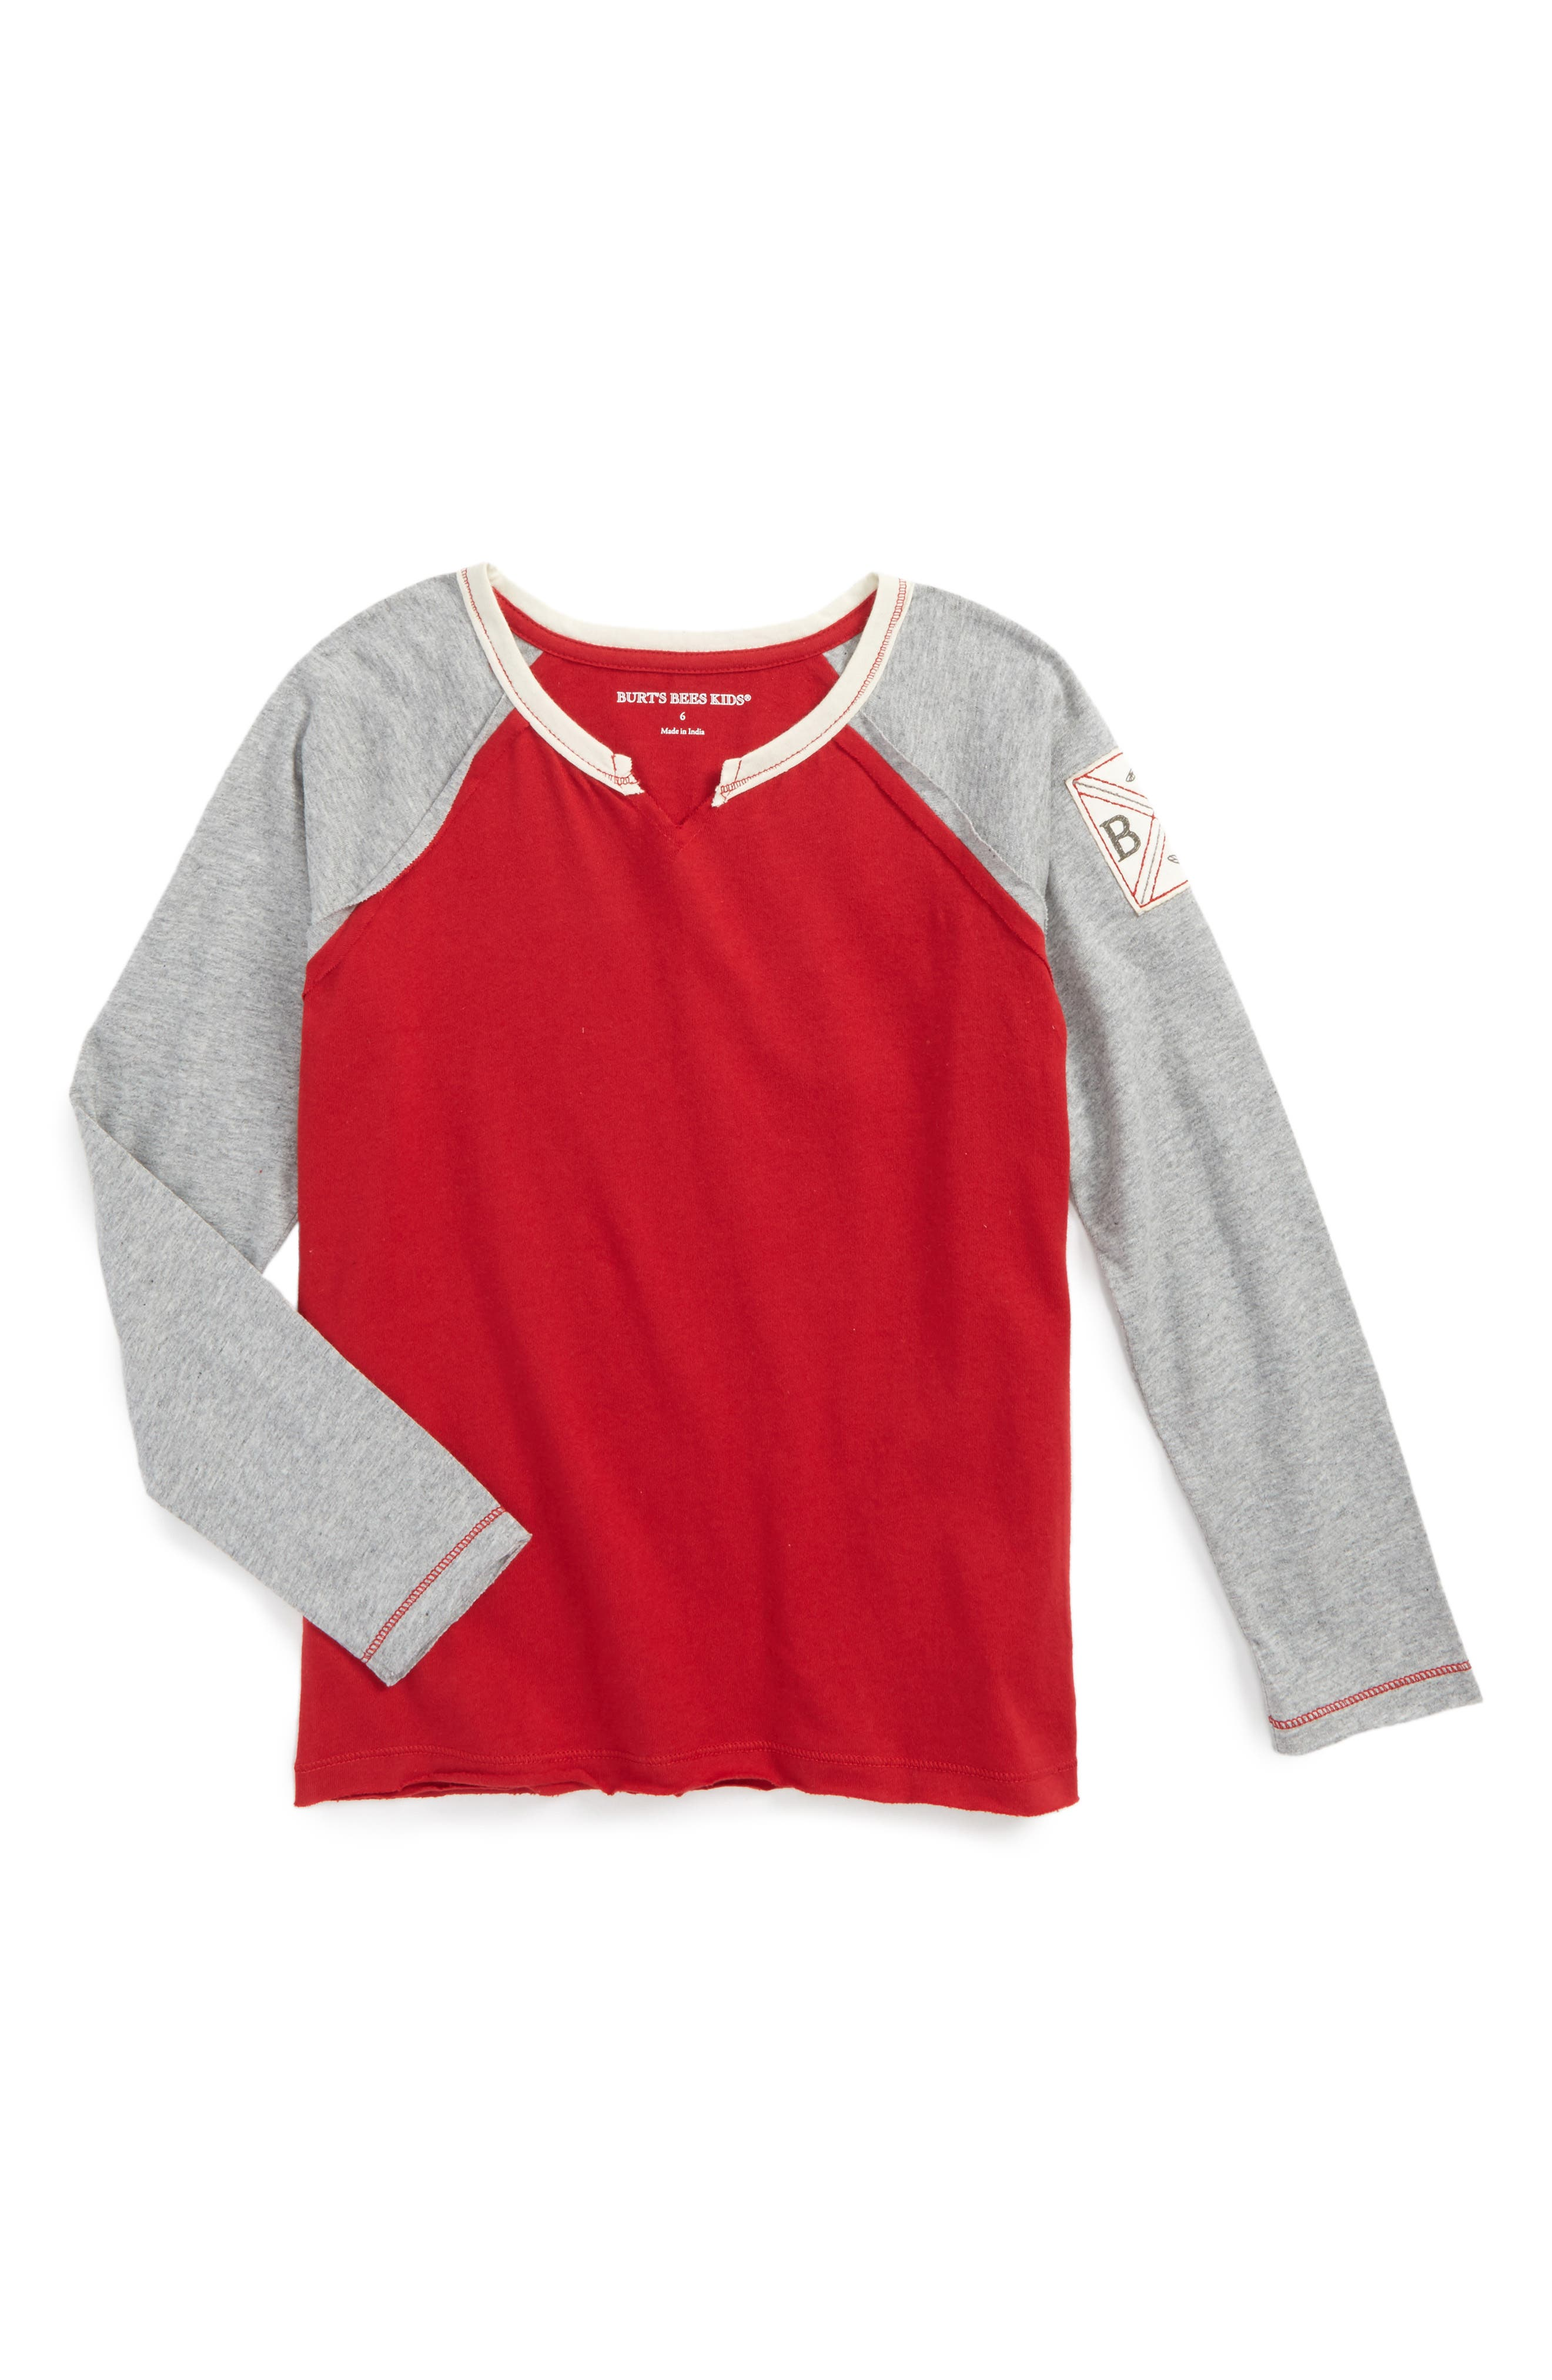 Burt's Bees Baby Colorblock Organic Cotton Raglan T-Shirt (Toddler Boys & Little Boys)